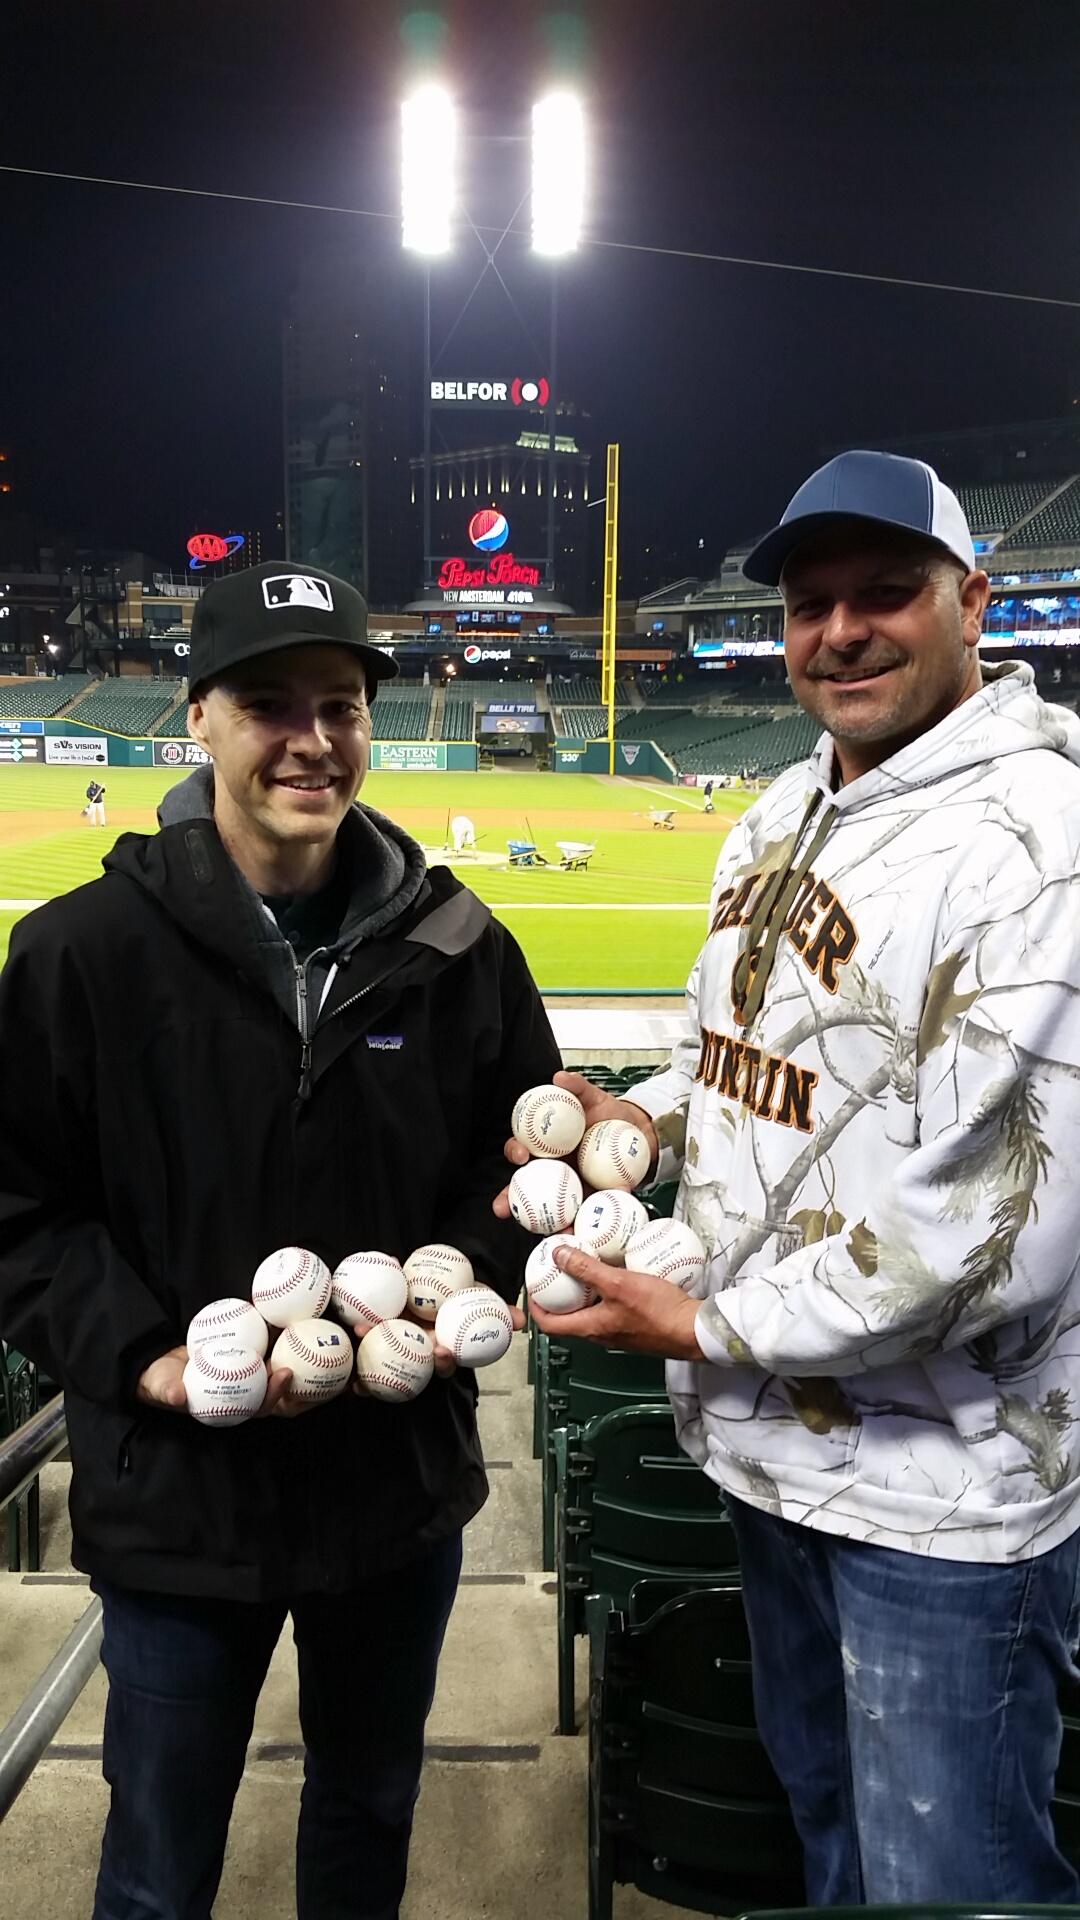 86_zack_and_bill_with_baseballs_final_tally_ten_to_six.JPG